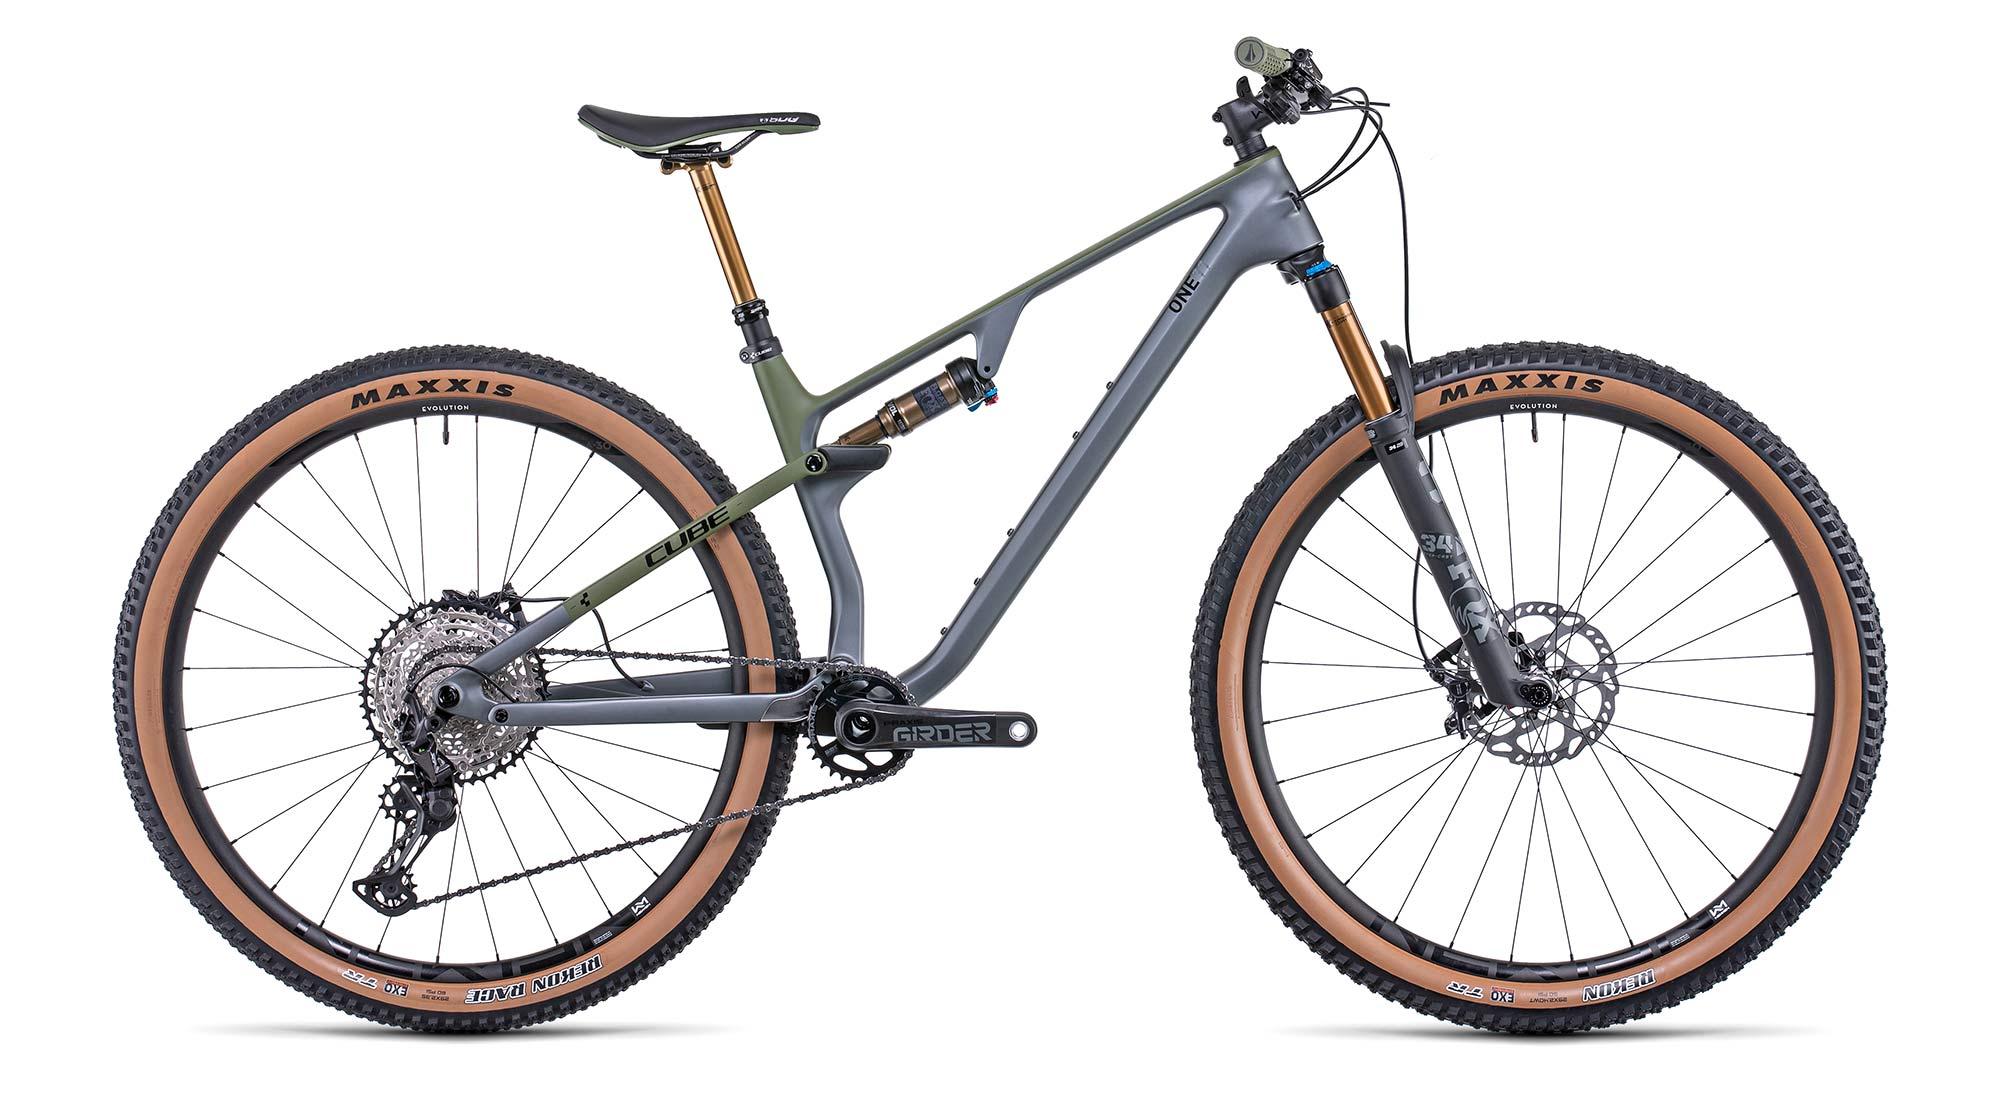 2022 Cube AMS One11 C:68X 29, lightweight carbon XC Marathon Trail mountain bike,TM complete